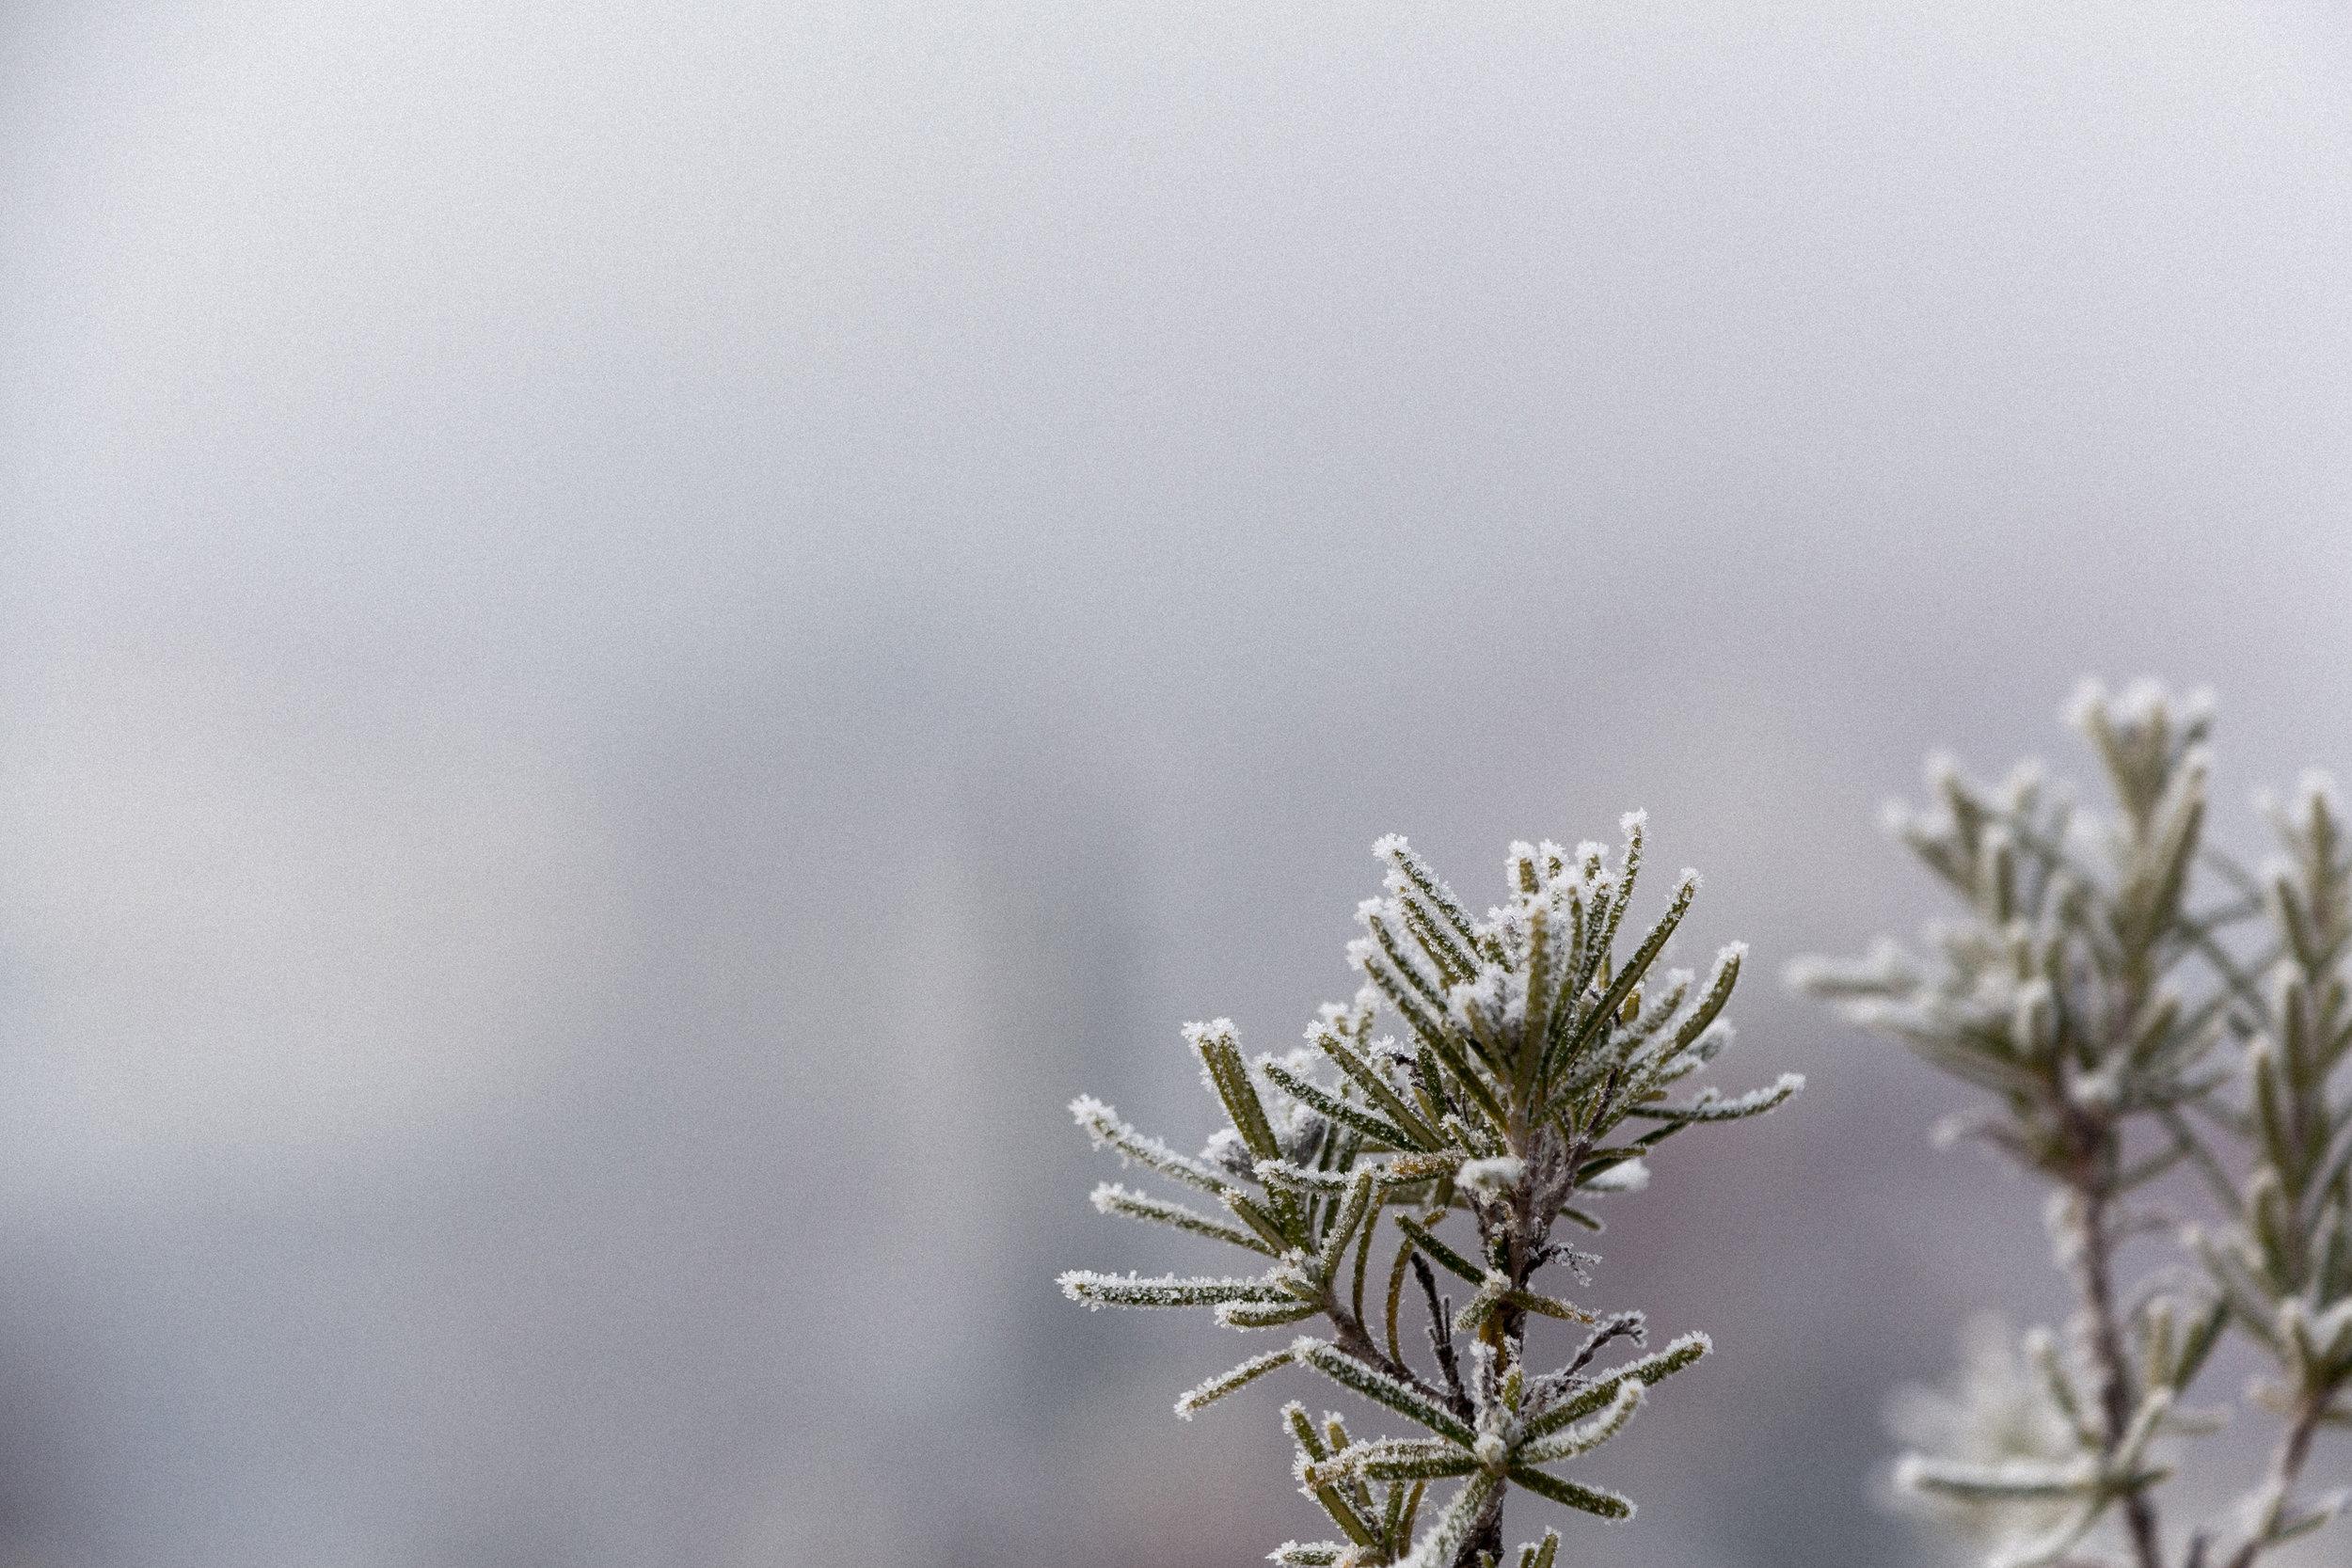 Rosemary-in-winter